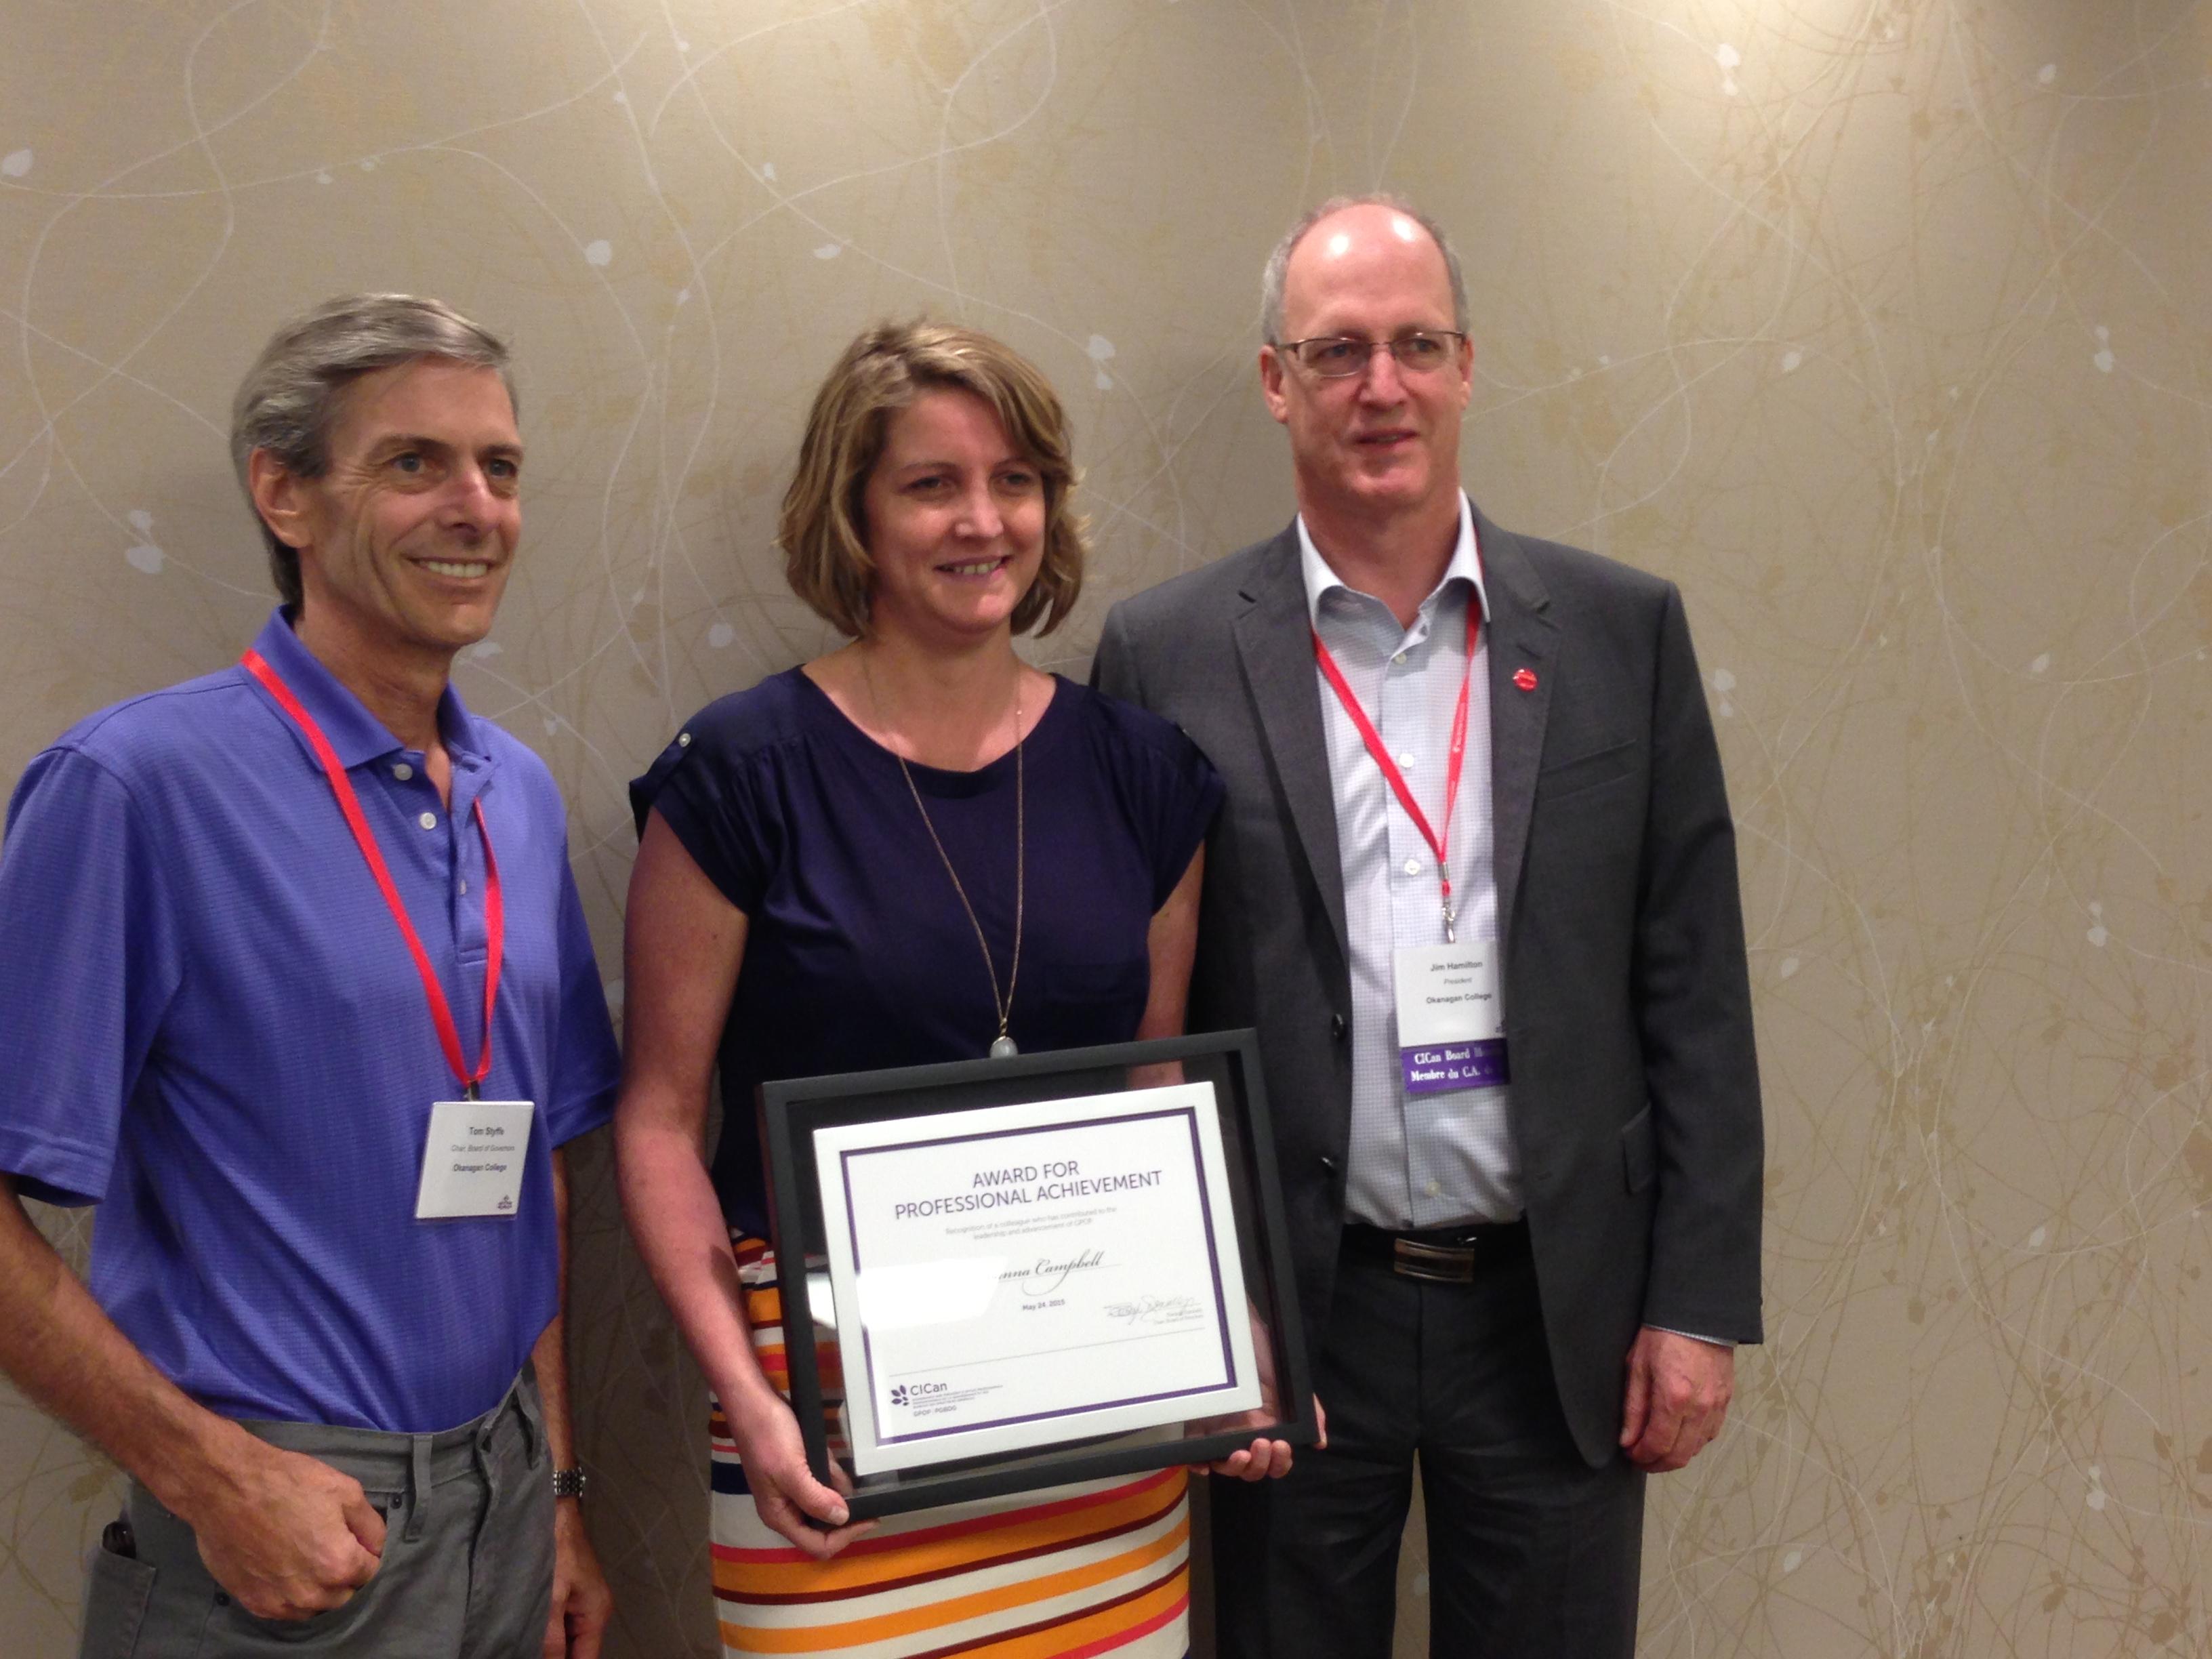 awards grants joanna campbell professional achievement award 2015